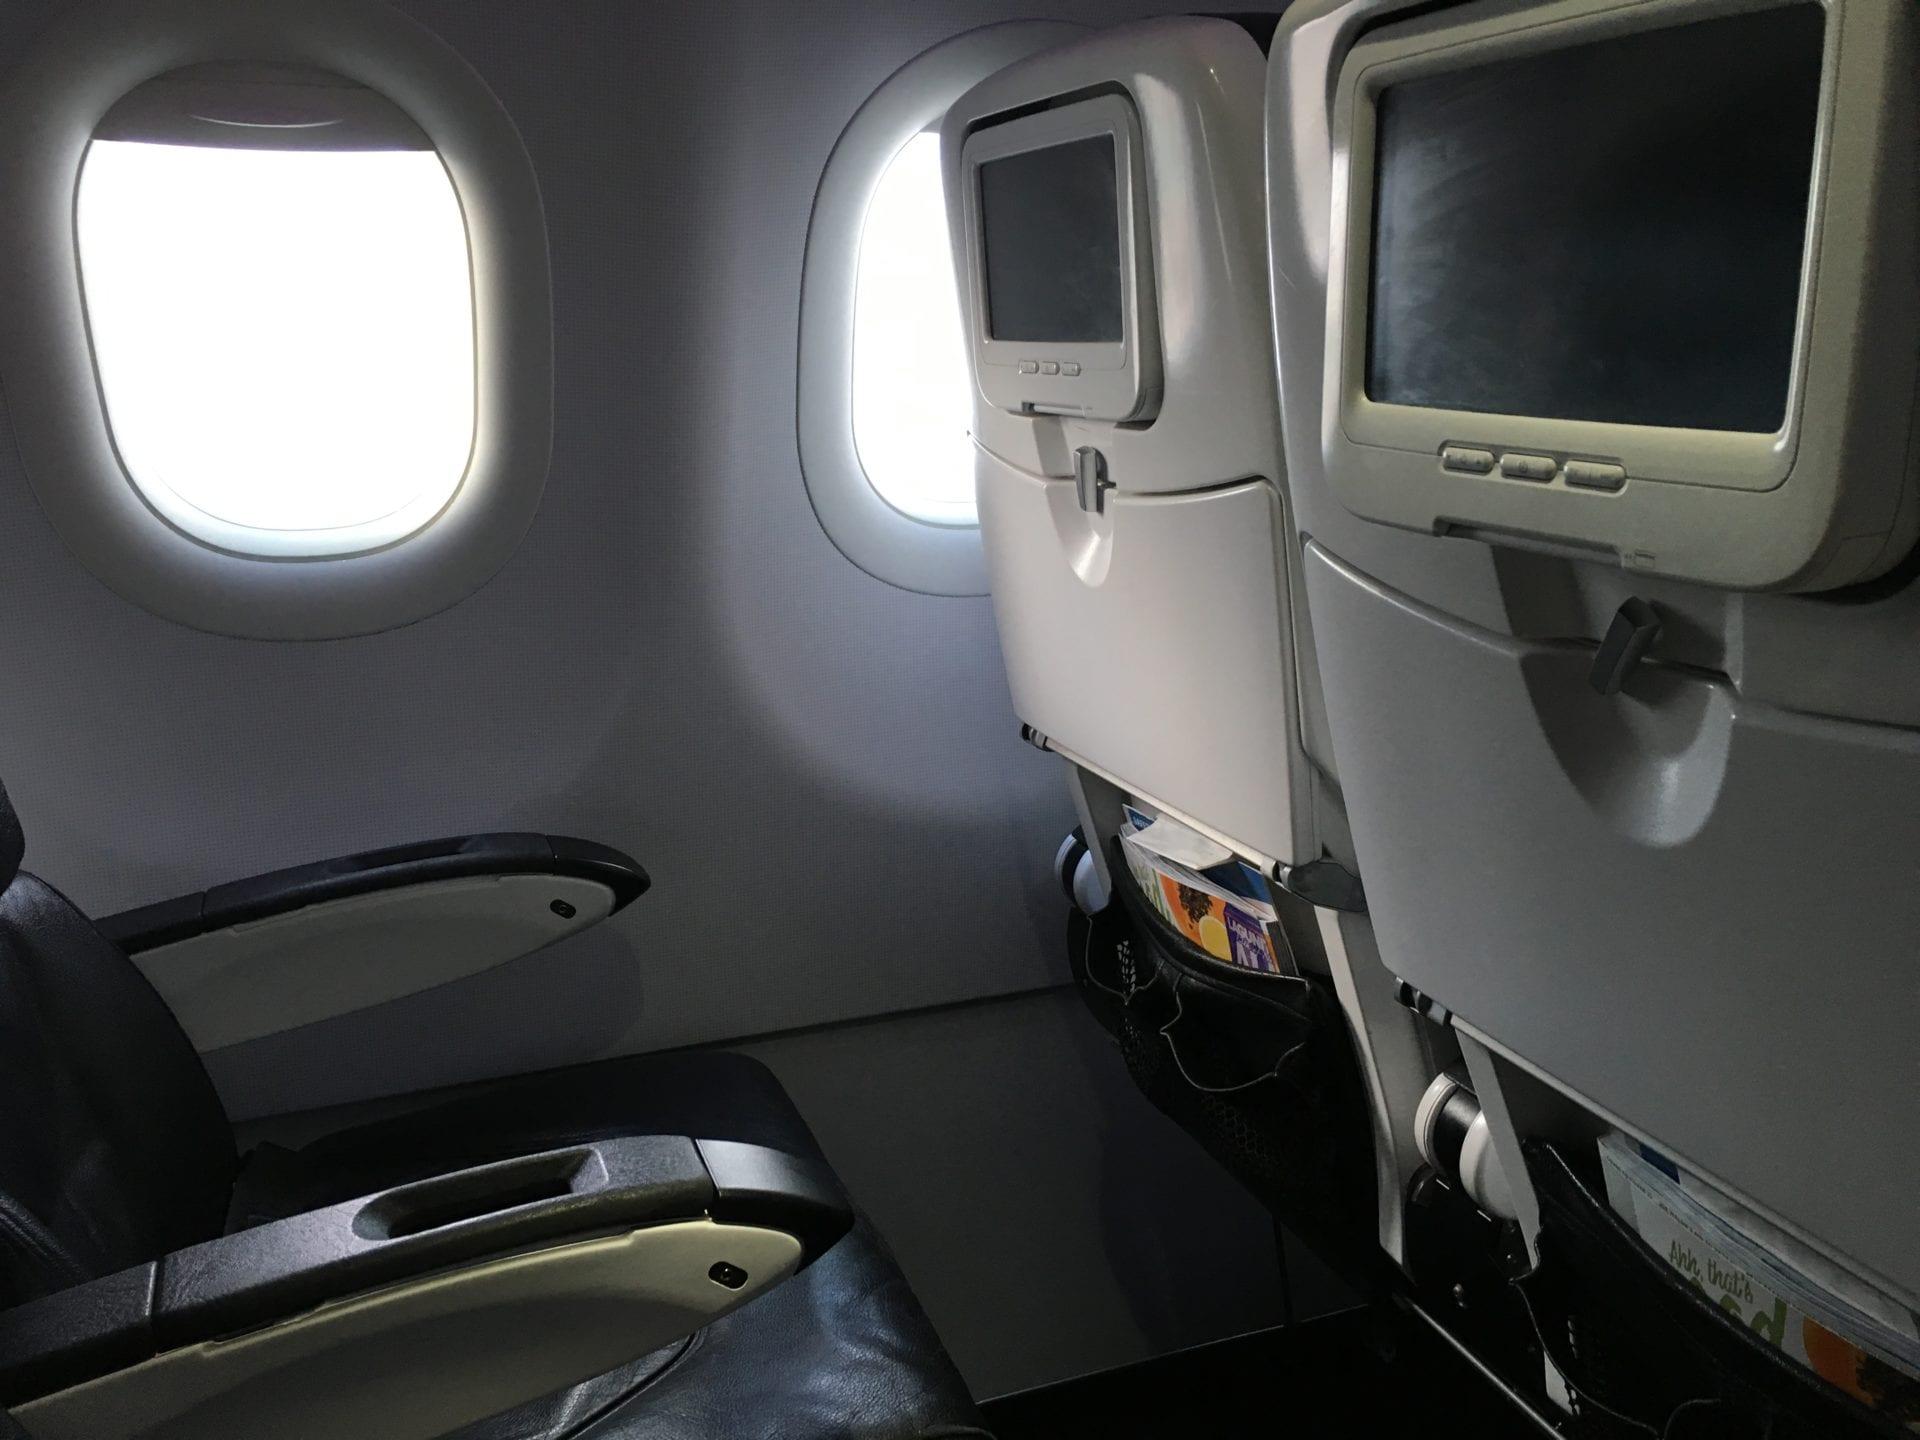 Alaska Airlines Economy Class Entertainment 2